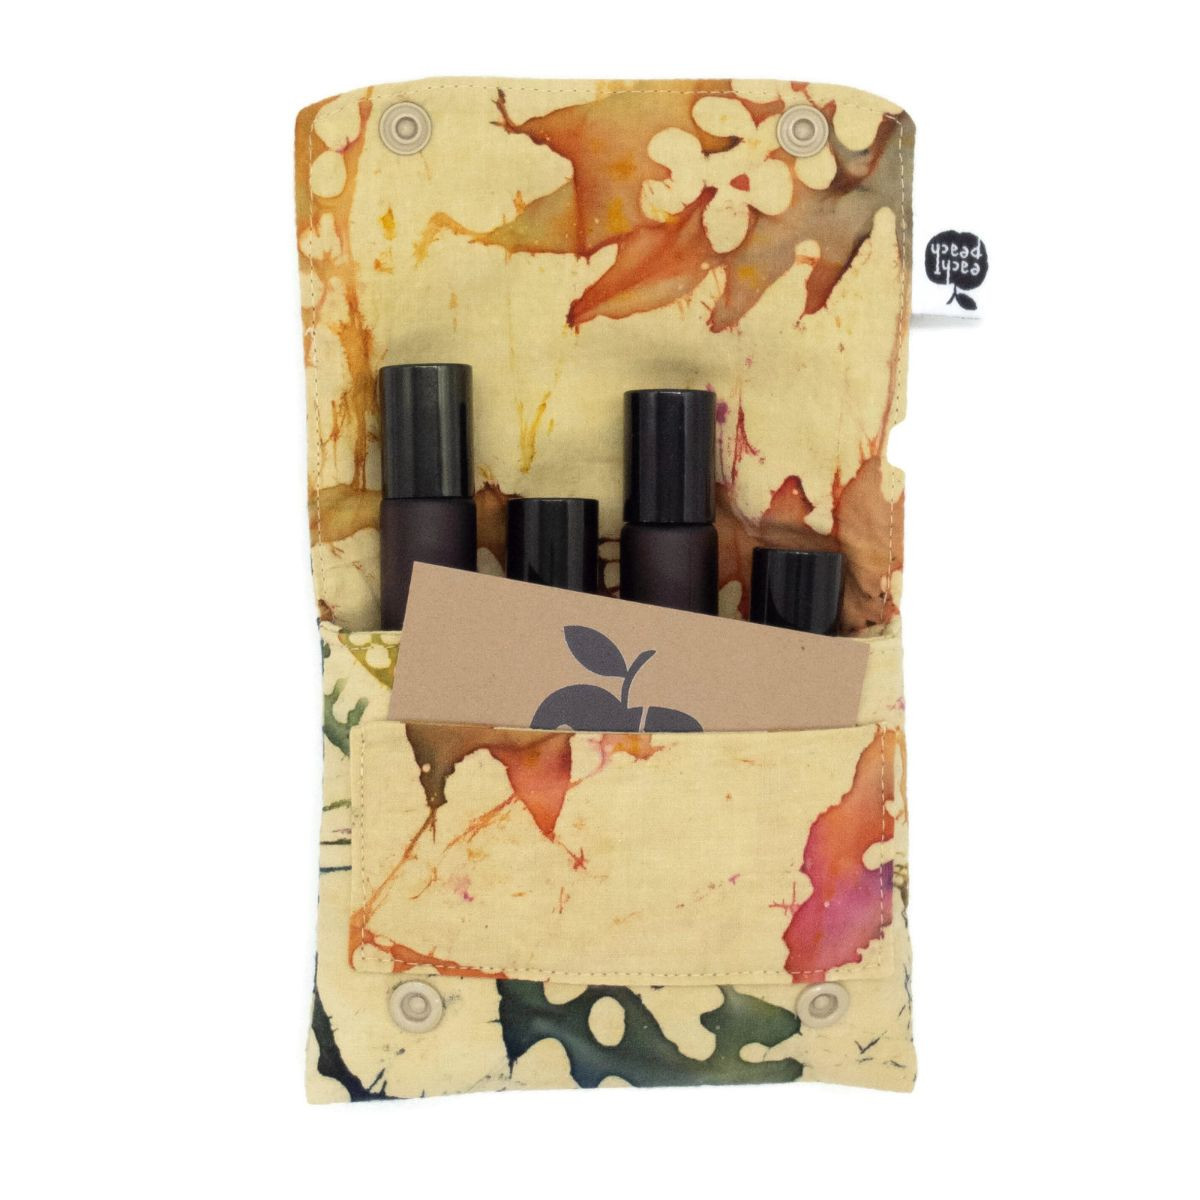 essential-oil-storage-bag-beige